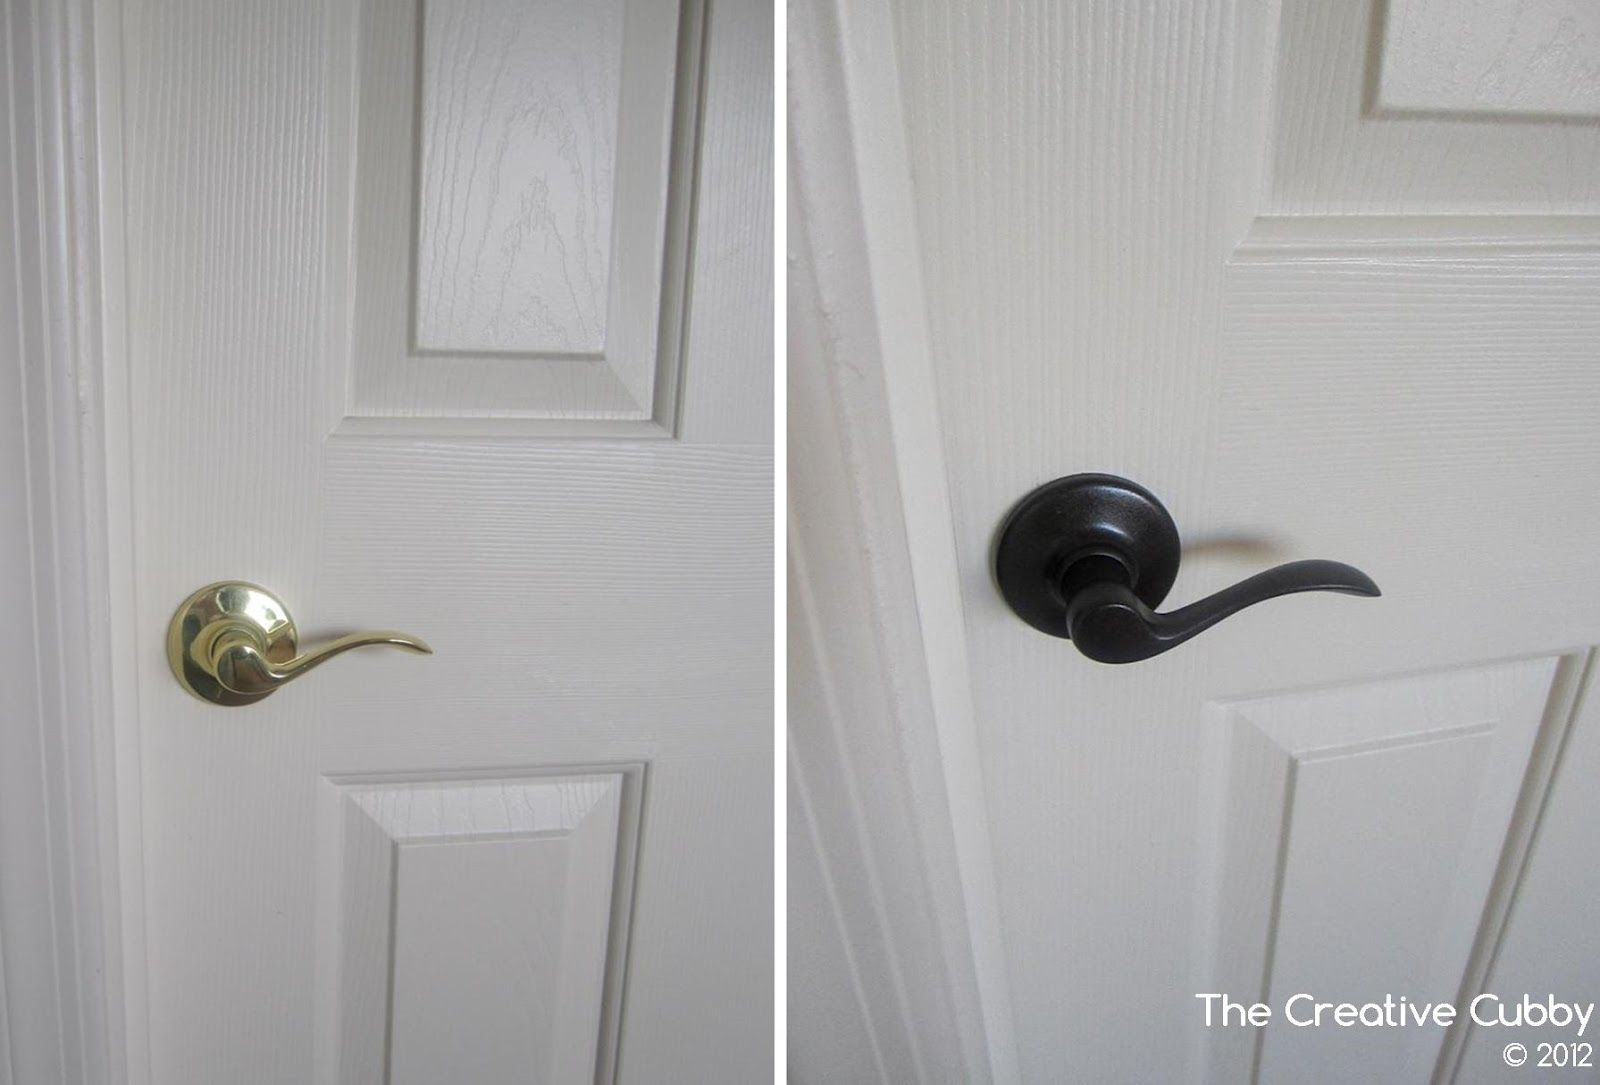 153 Reference Of Door Handles Pull Interior In 2020 Gold Door Handles Door Handles Door Handles Interior